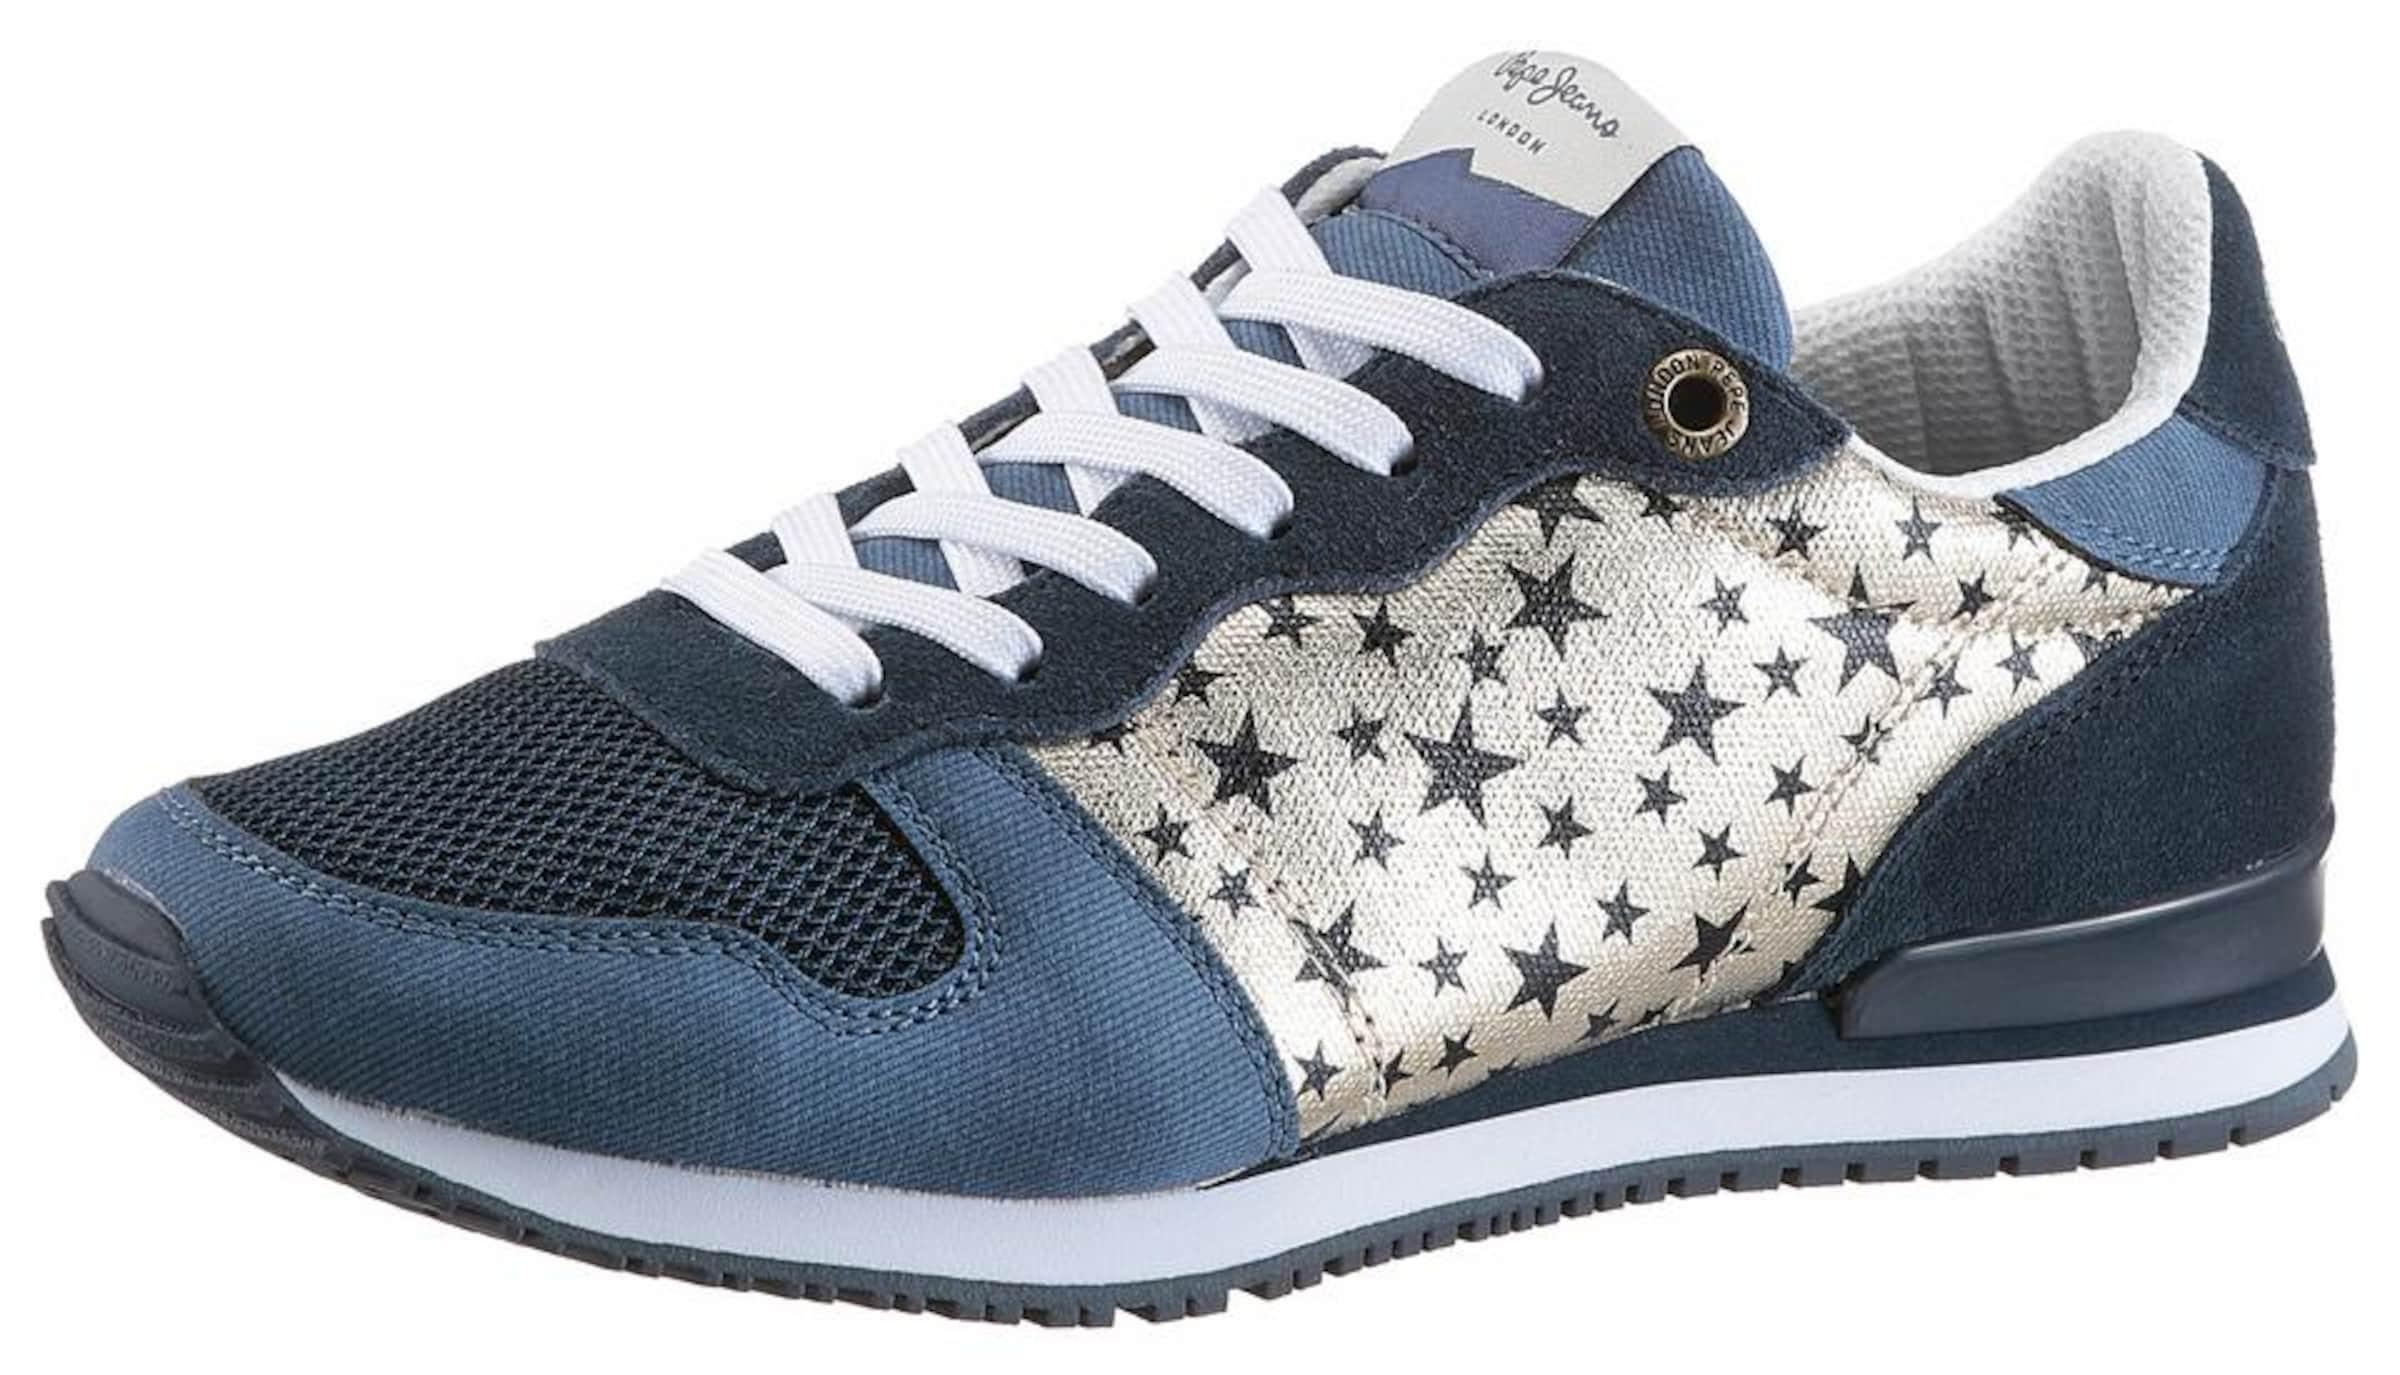 Angebot Pepe Jeans Pepe Jeans Sneaker »Gable Galatic« Erschwinglich Billige Visum Zahlung 2018 Unisex Günstig Kaufen Sast CIT6I